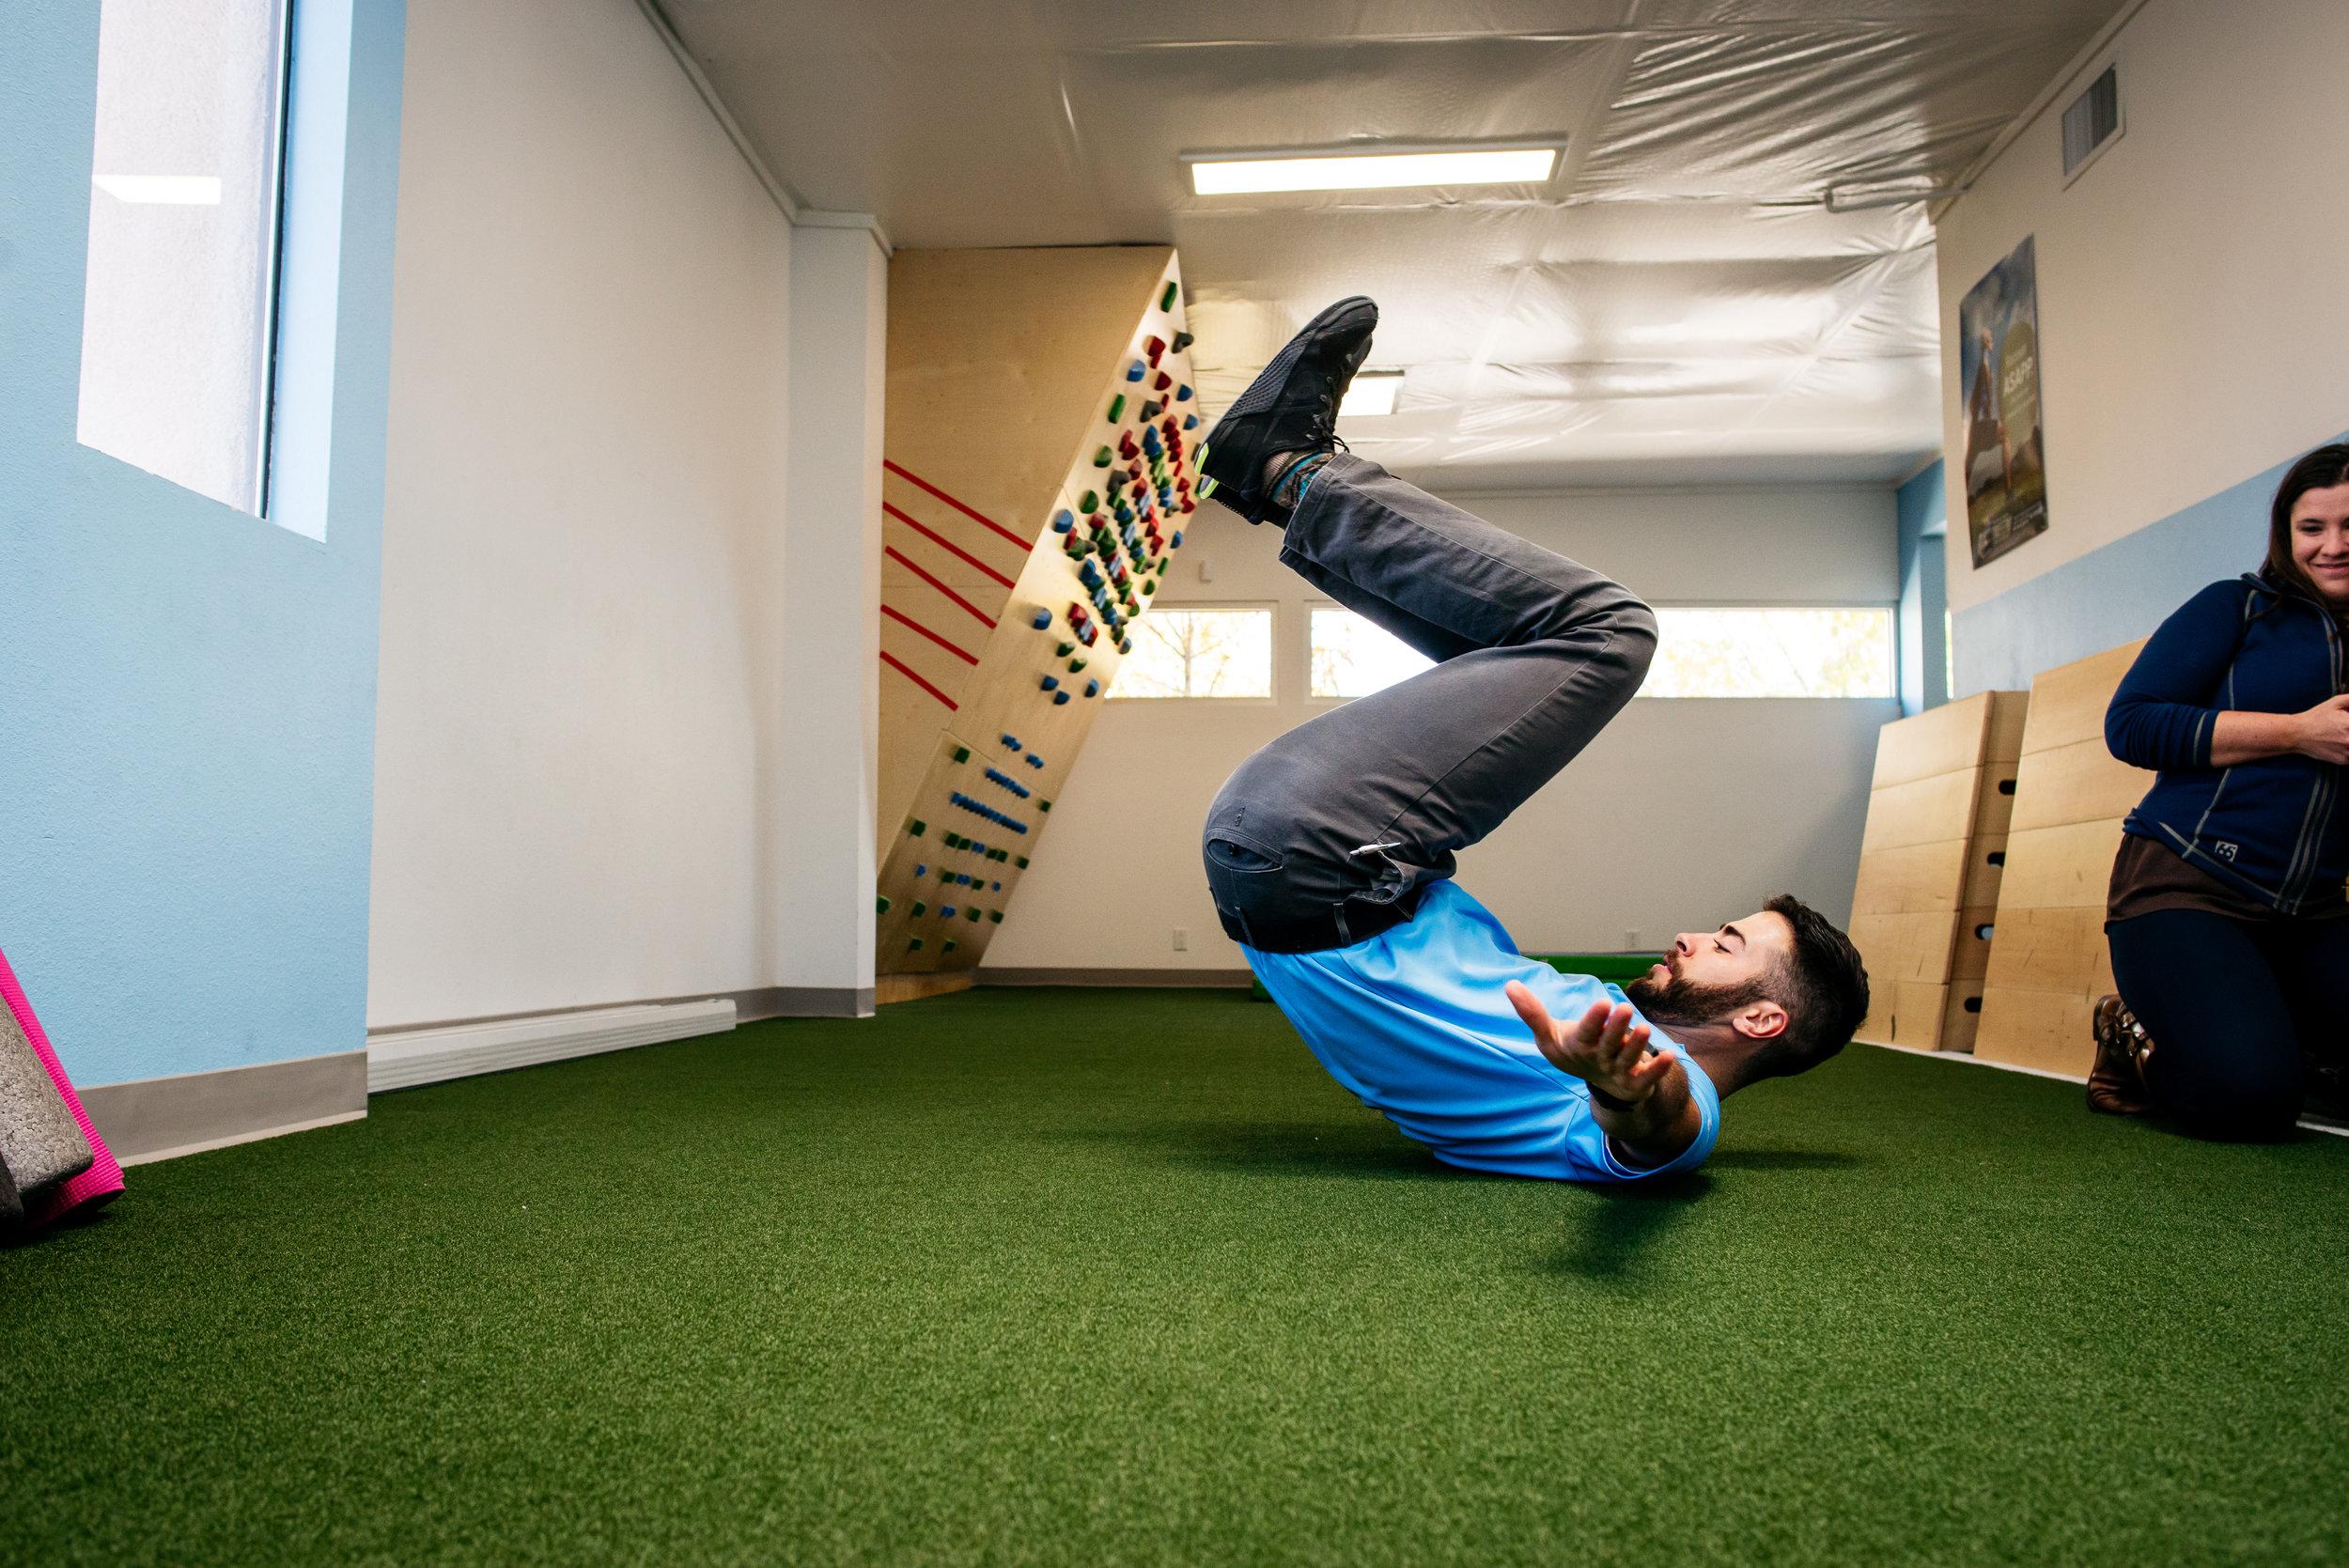 Falling backward snowboarding Nate Vigil Langford PT Albuquerque